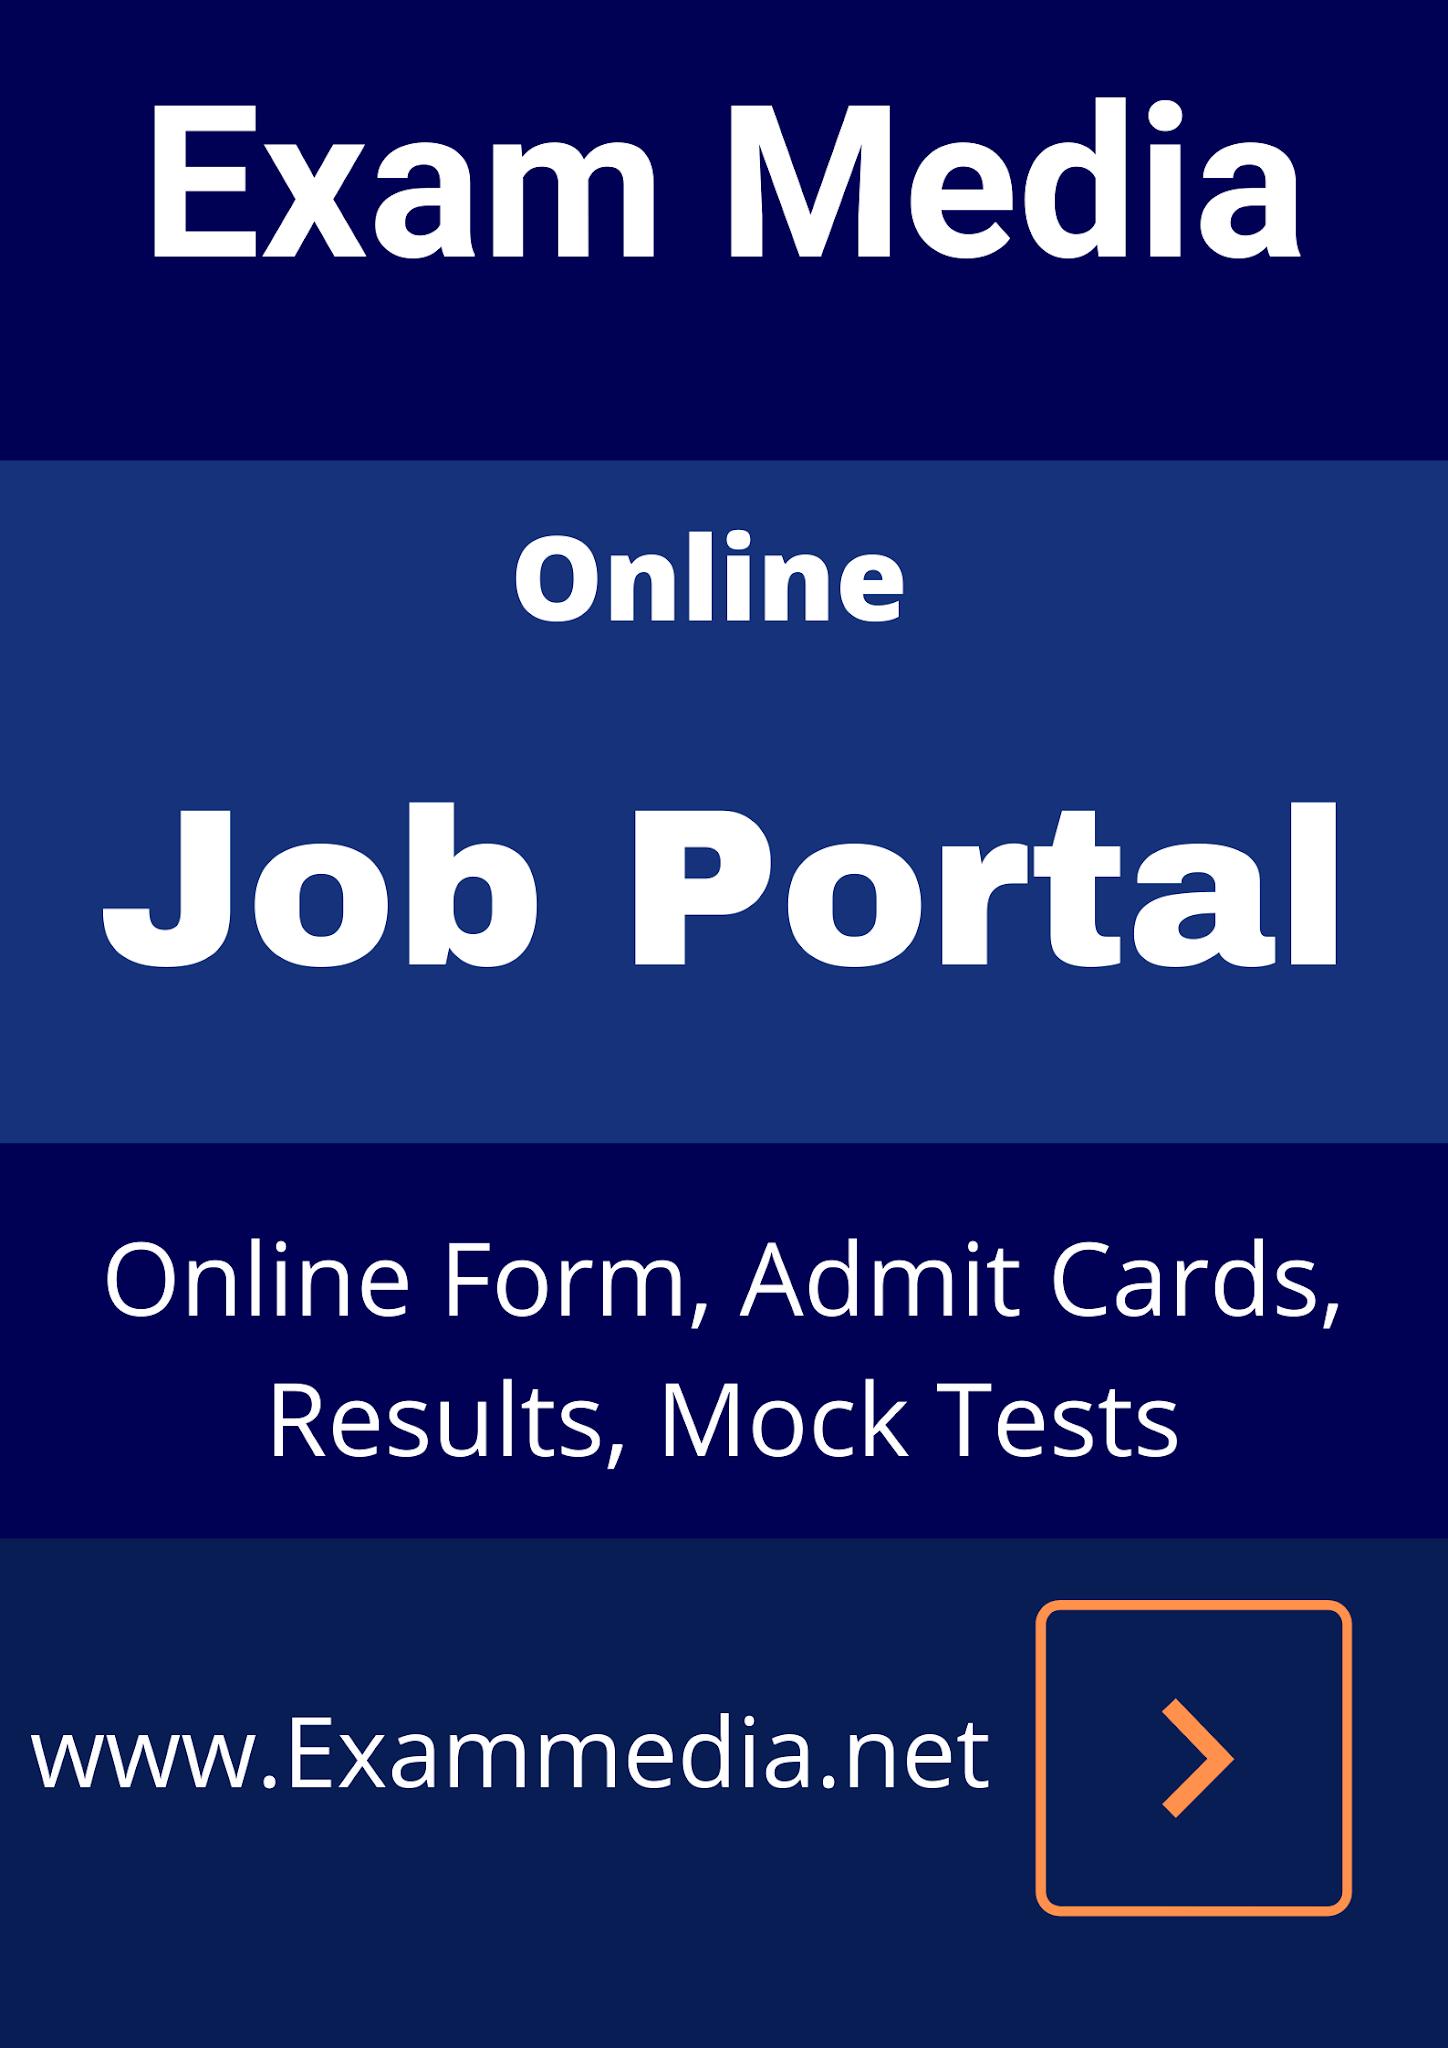 ExamMedia.net